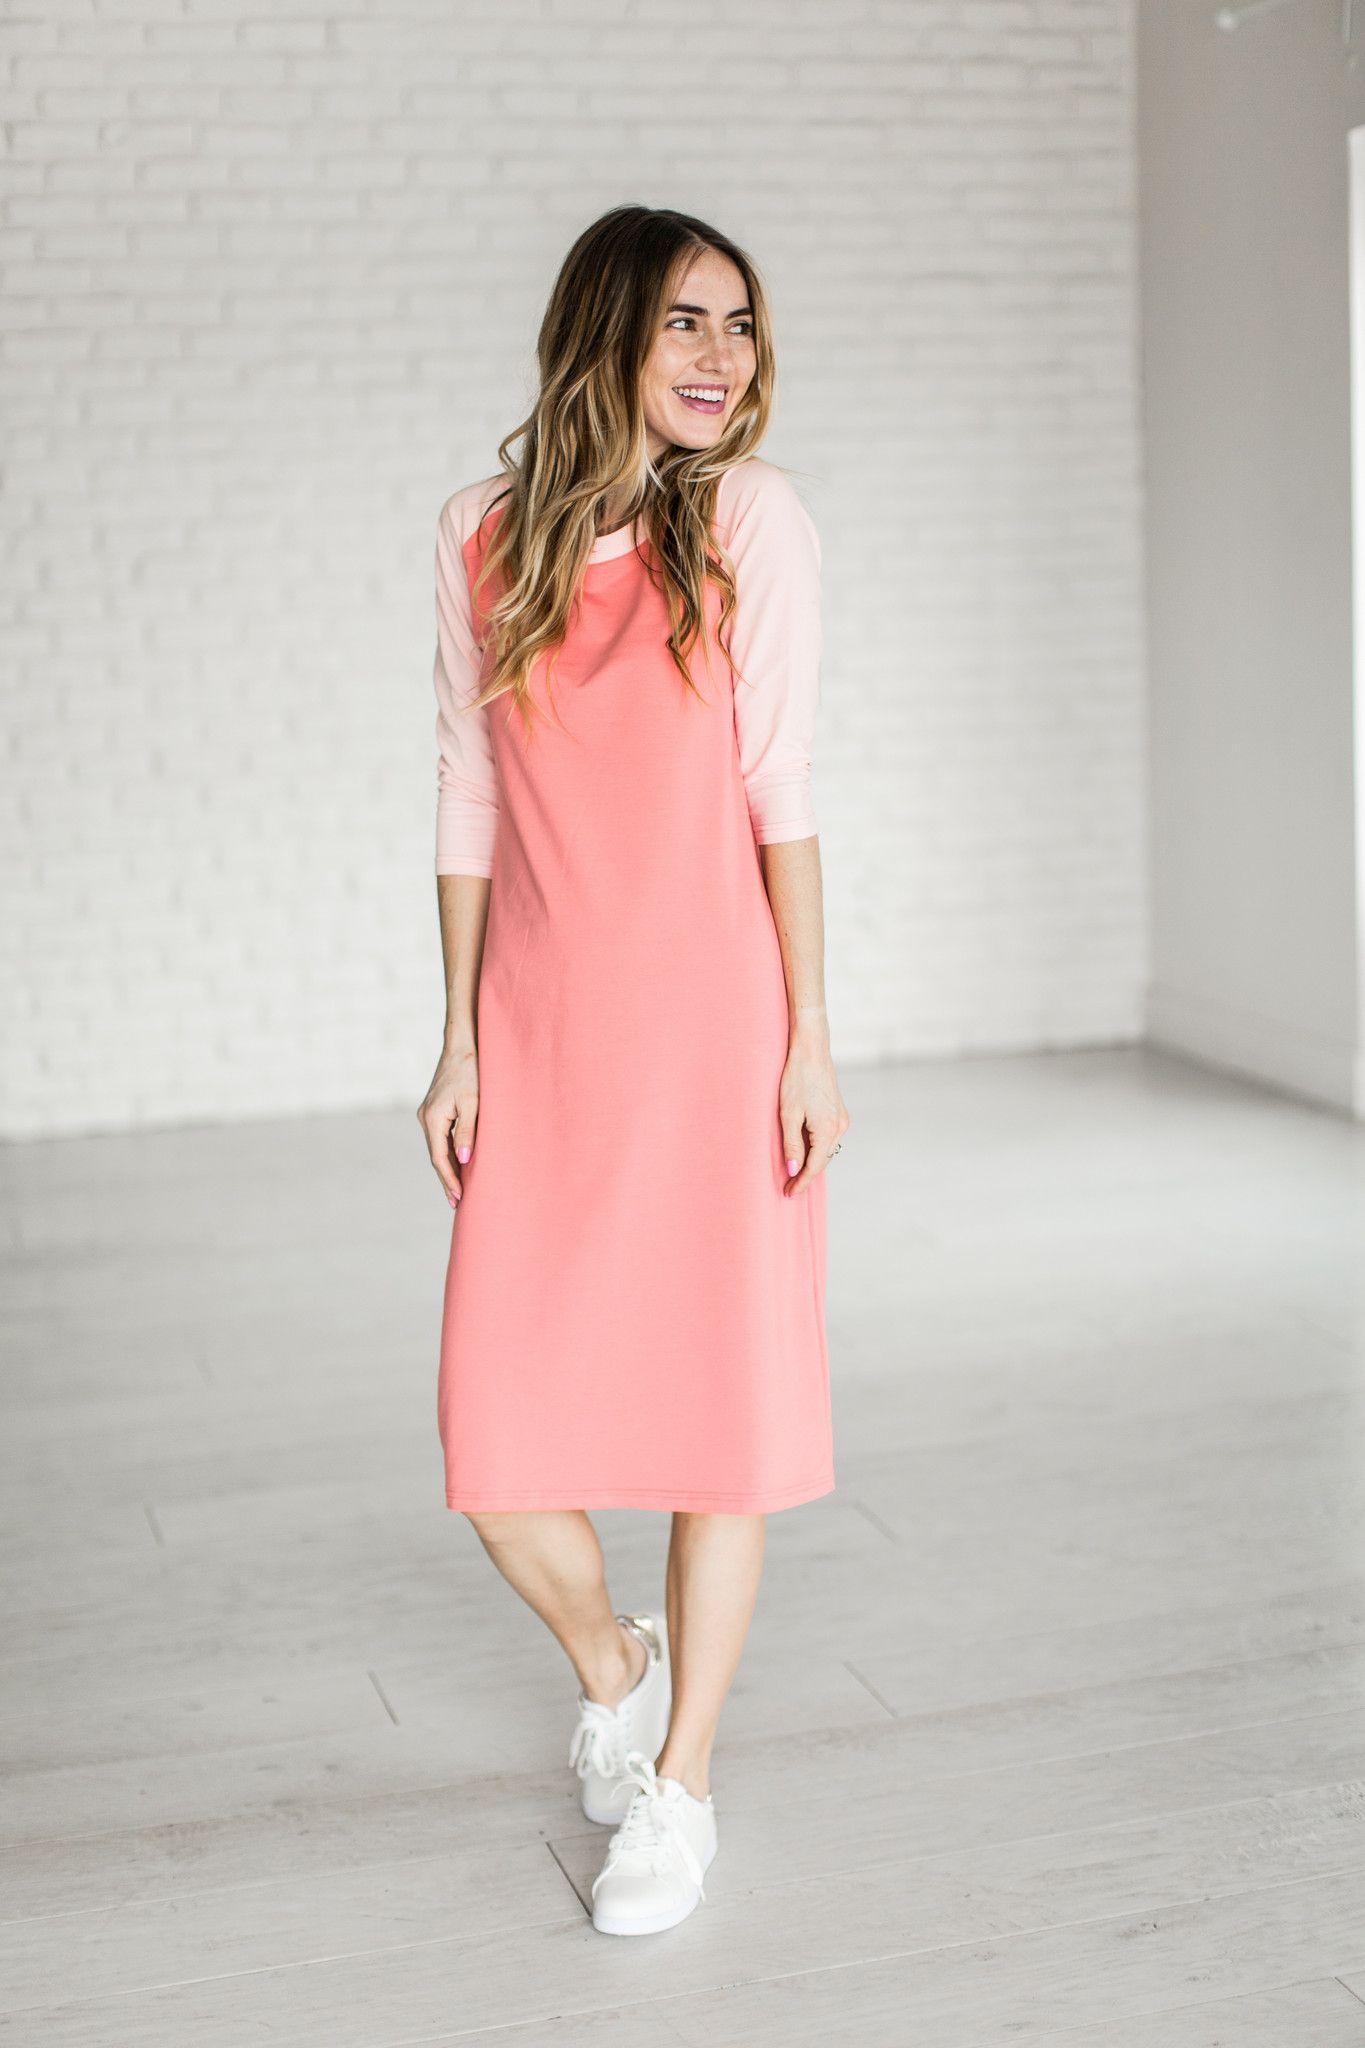 4c1ec8689e66 Dress Mindy Pinterest Pink In Mae s Market Baseball 2018 Dresses dSZAq7dn